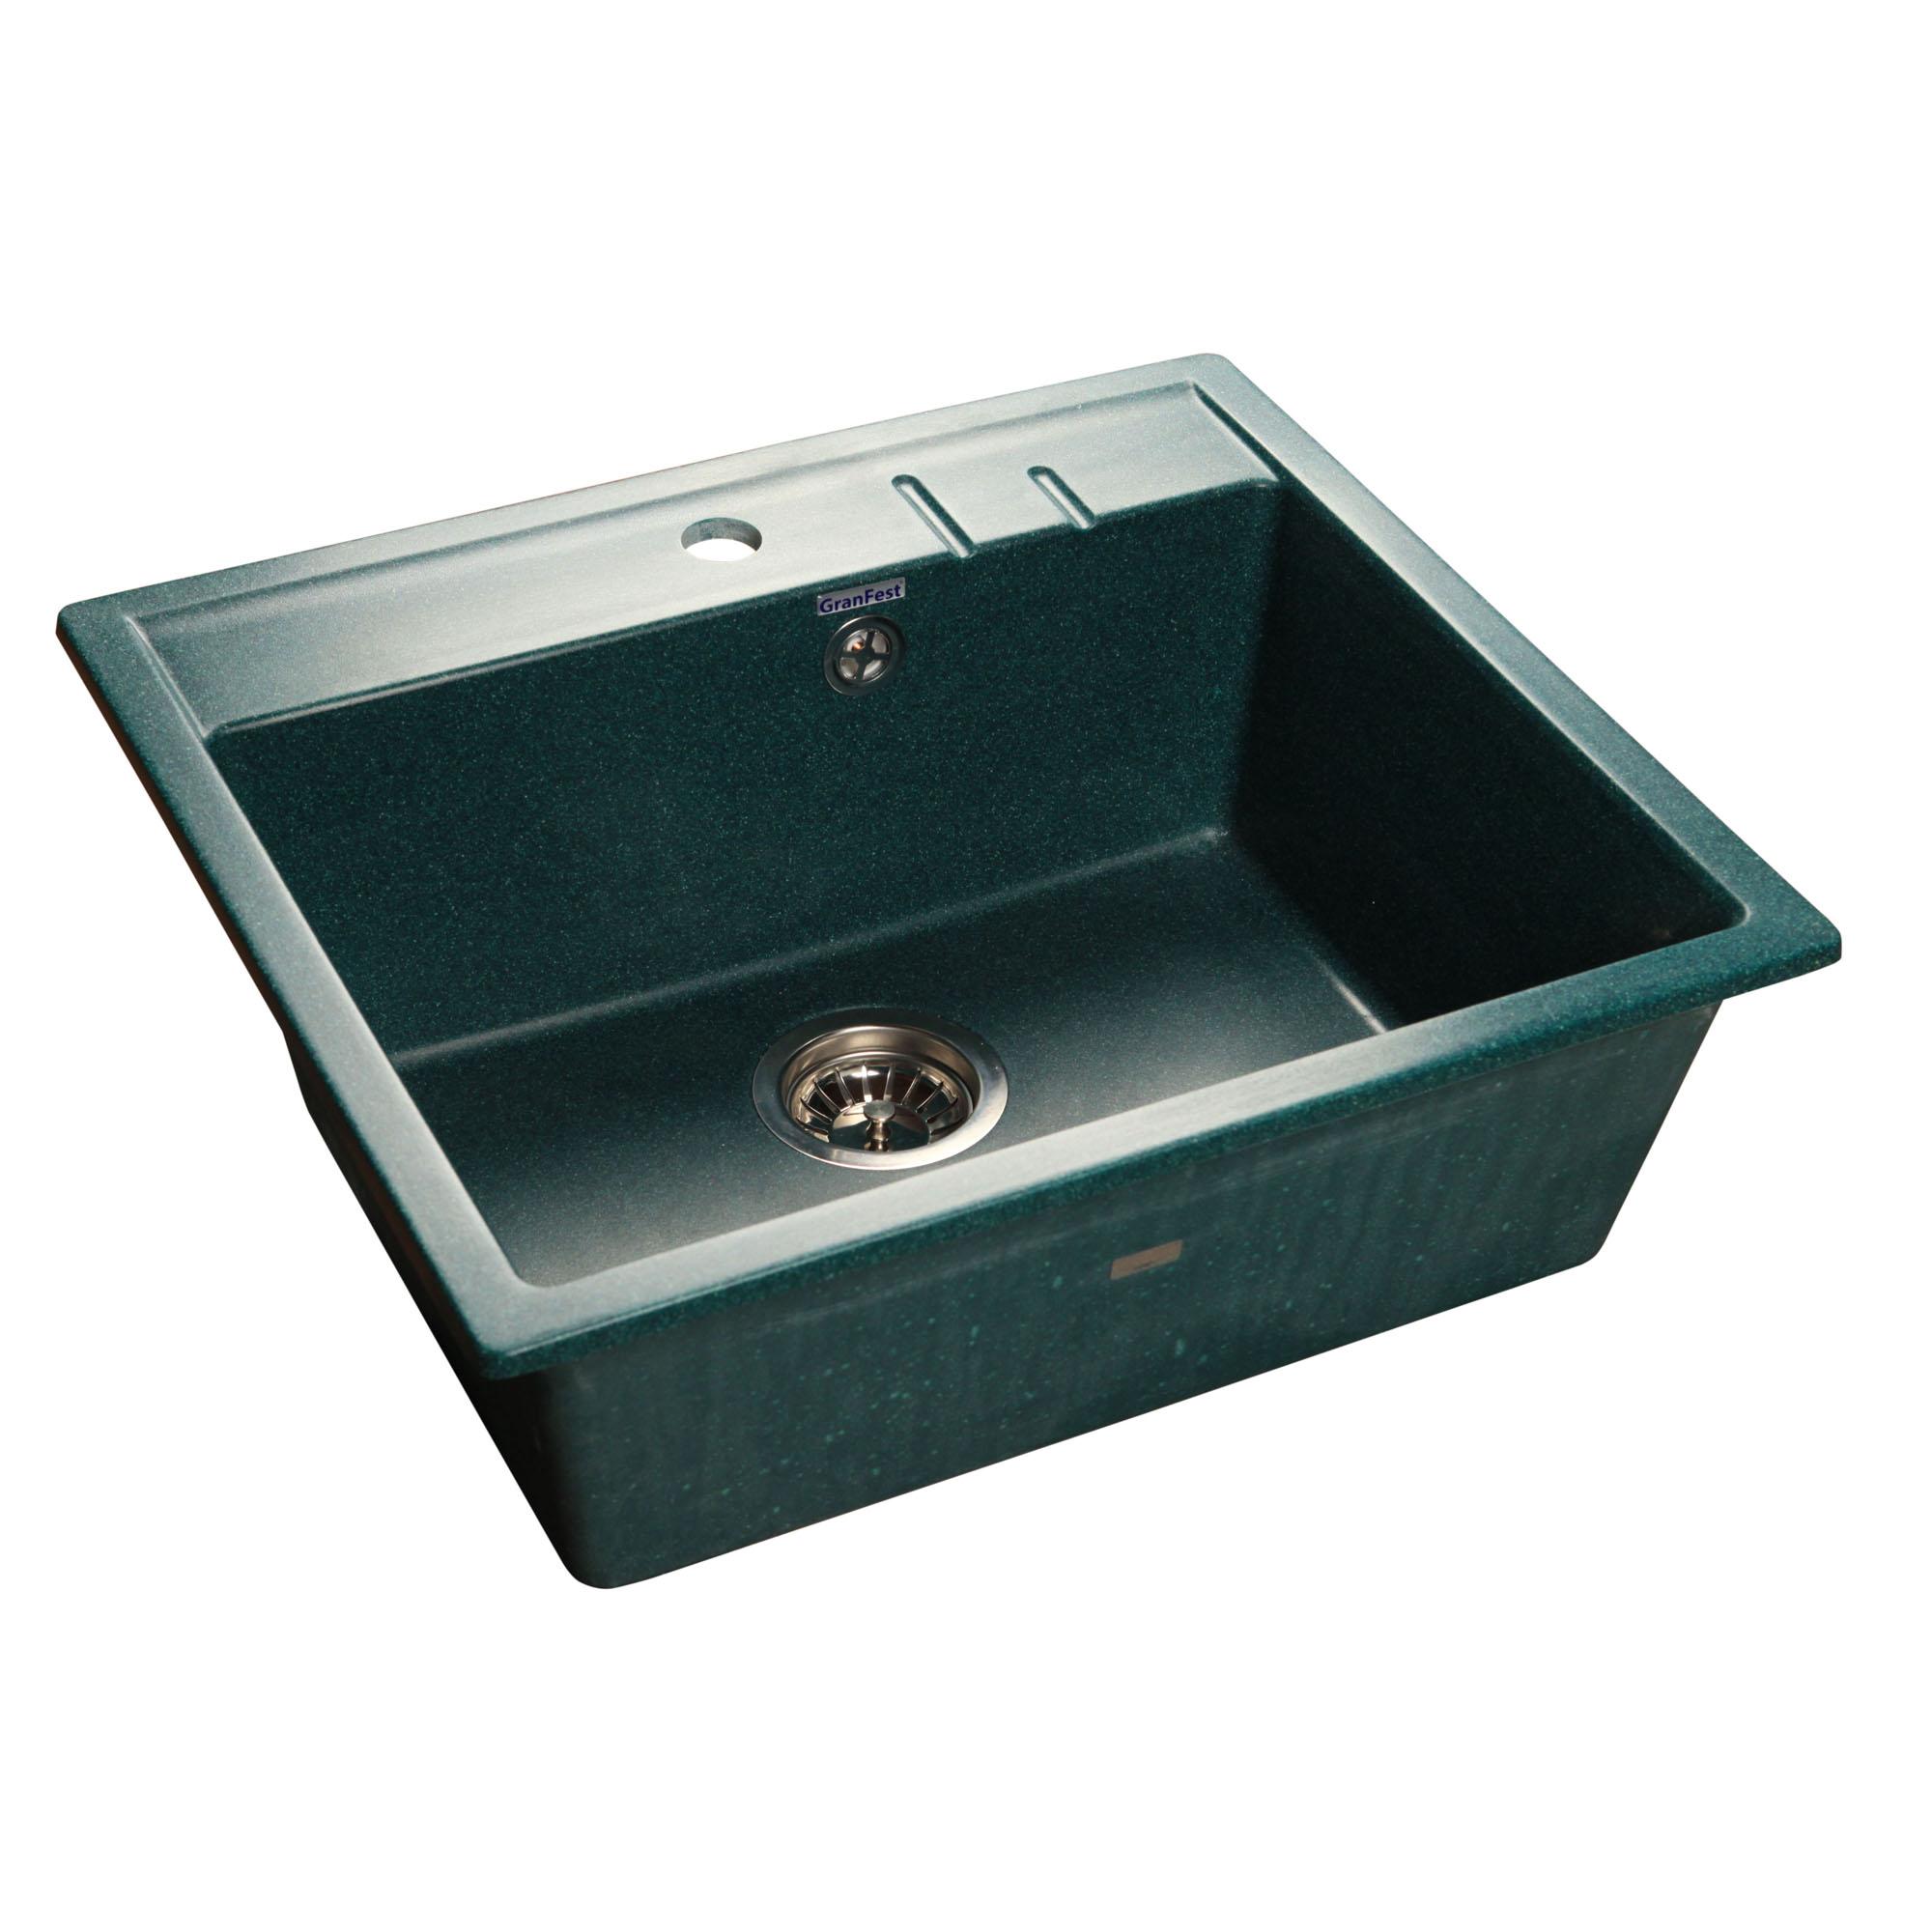 Кухонная мойка GranFest Quadro GF-Q560 зеленый